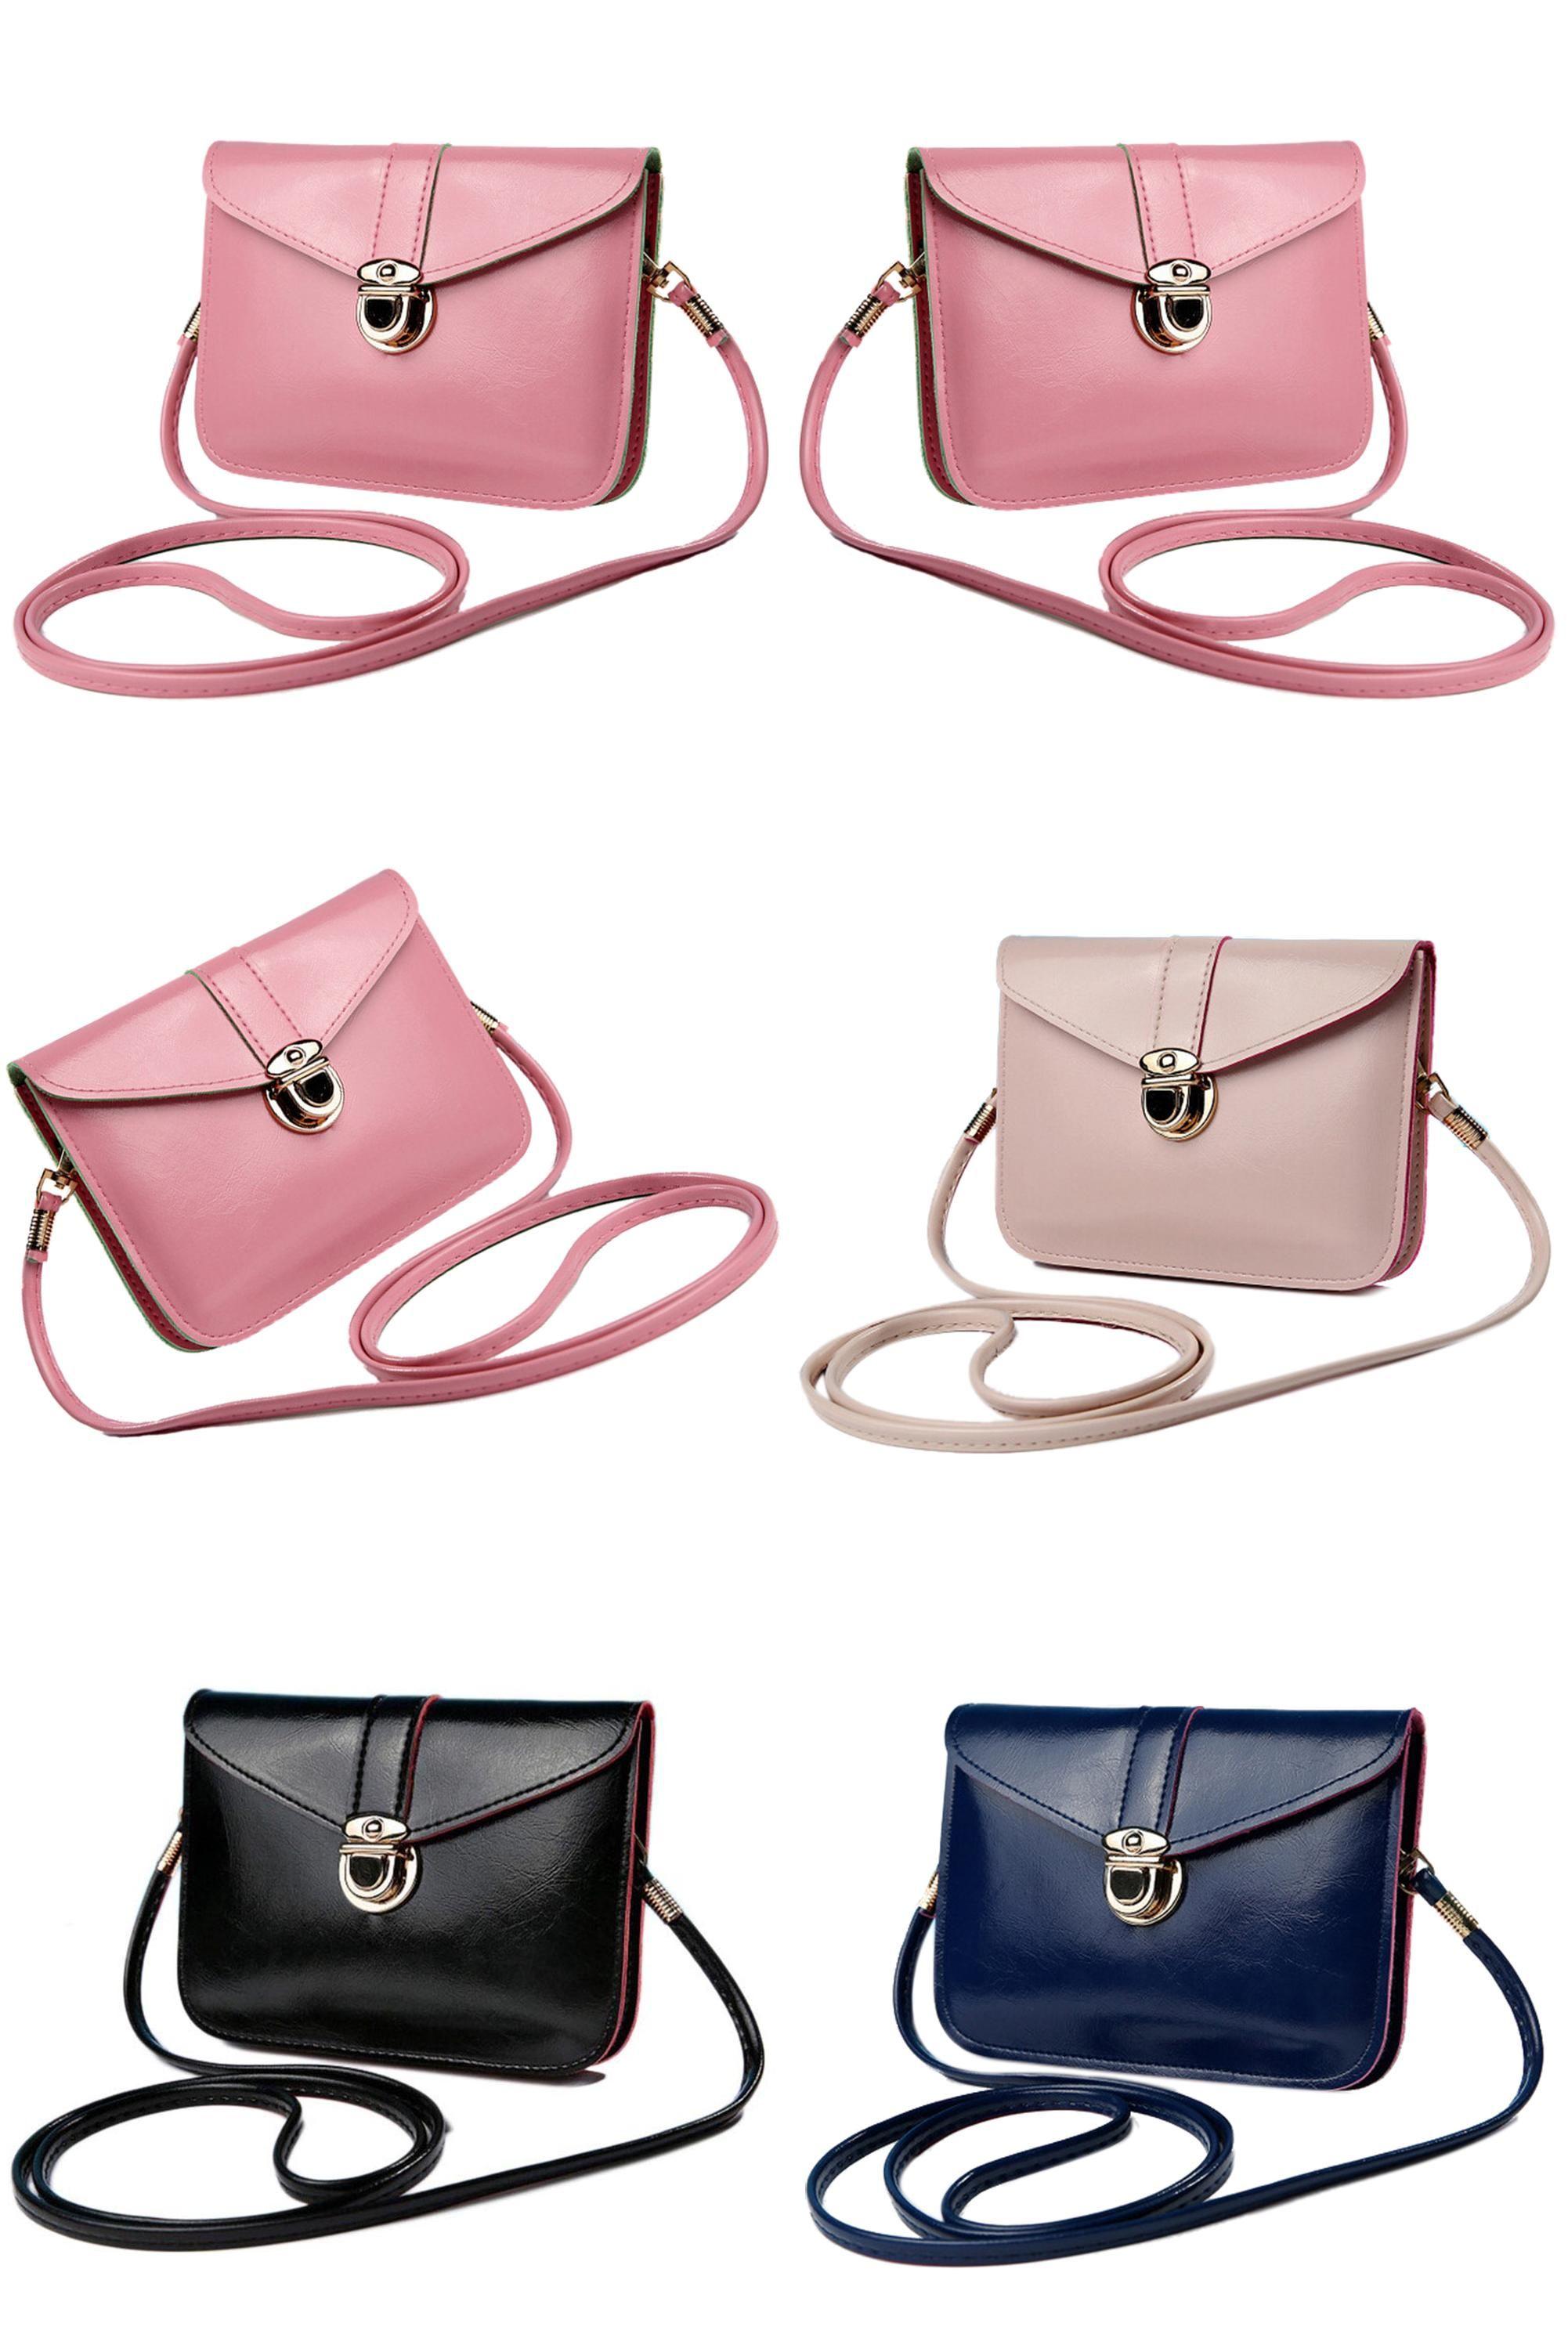 Retro European Style Handbags High-Quality PU Leather